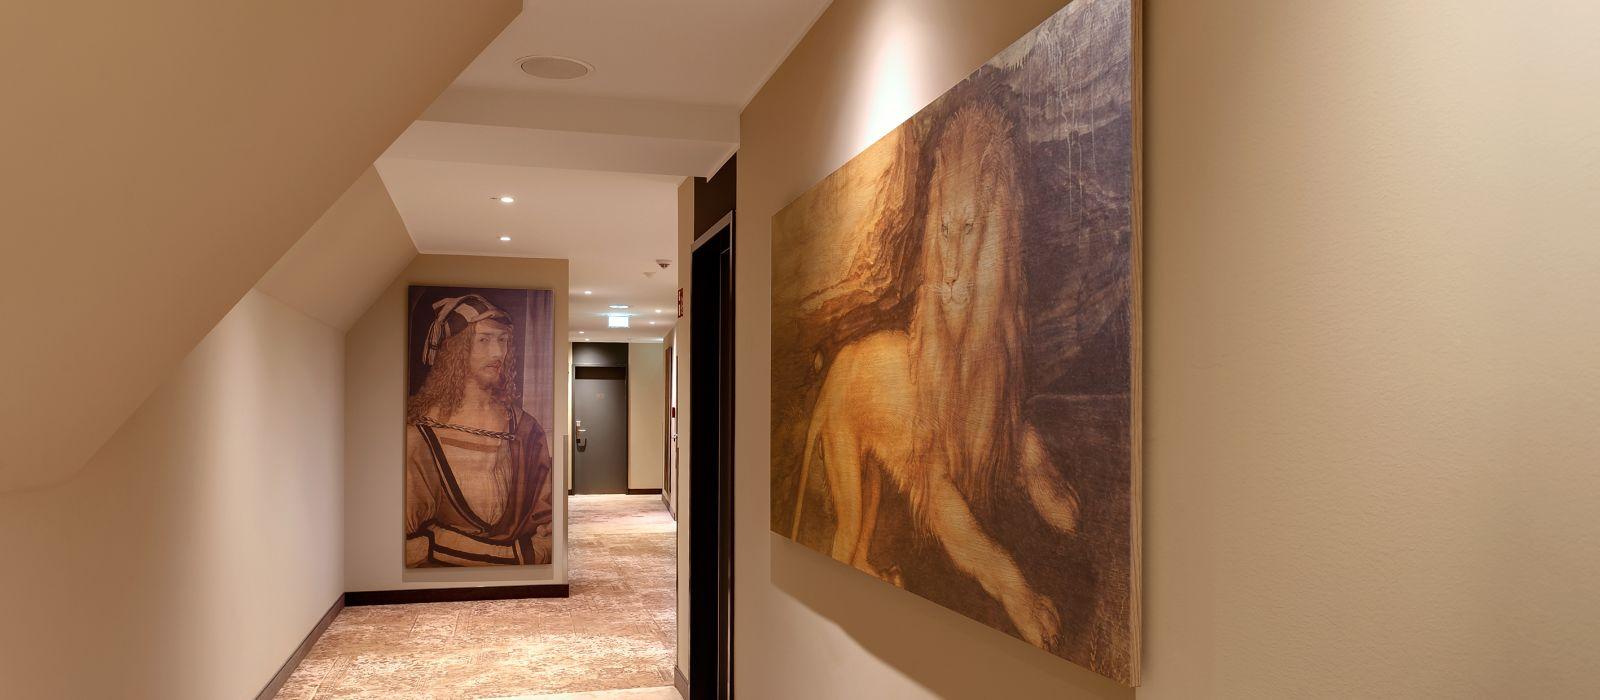 Hotel SORAT  Saxx Nuremberg Germany